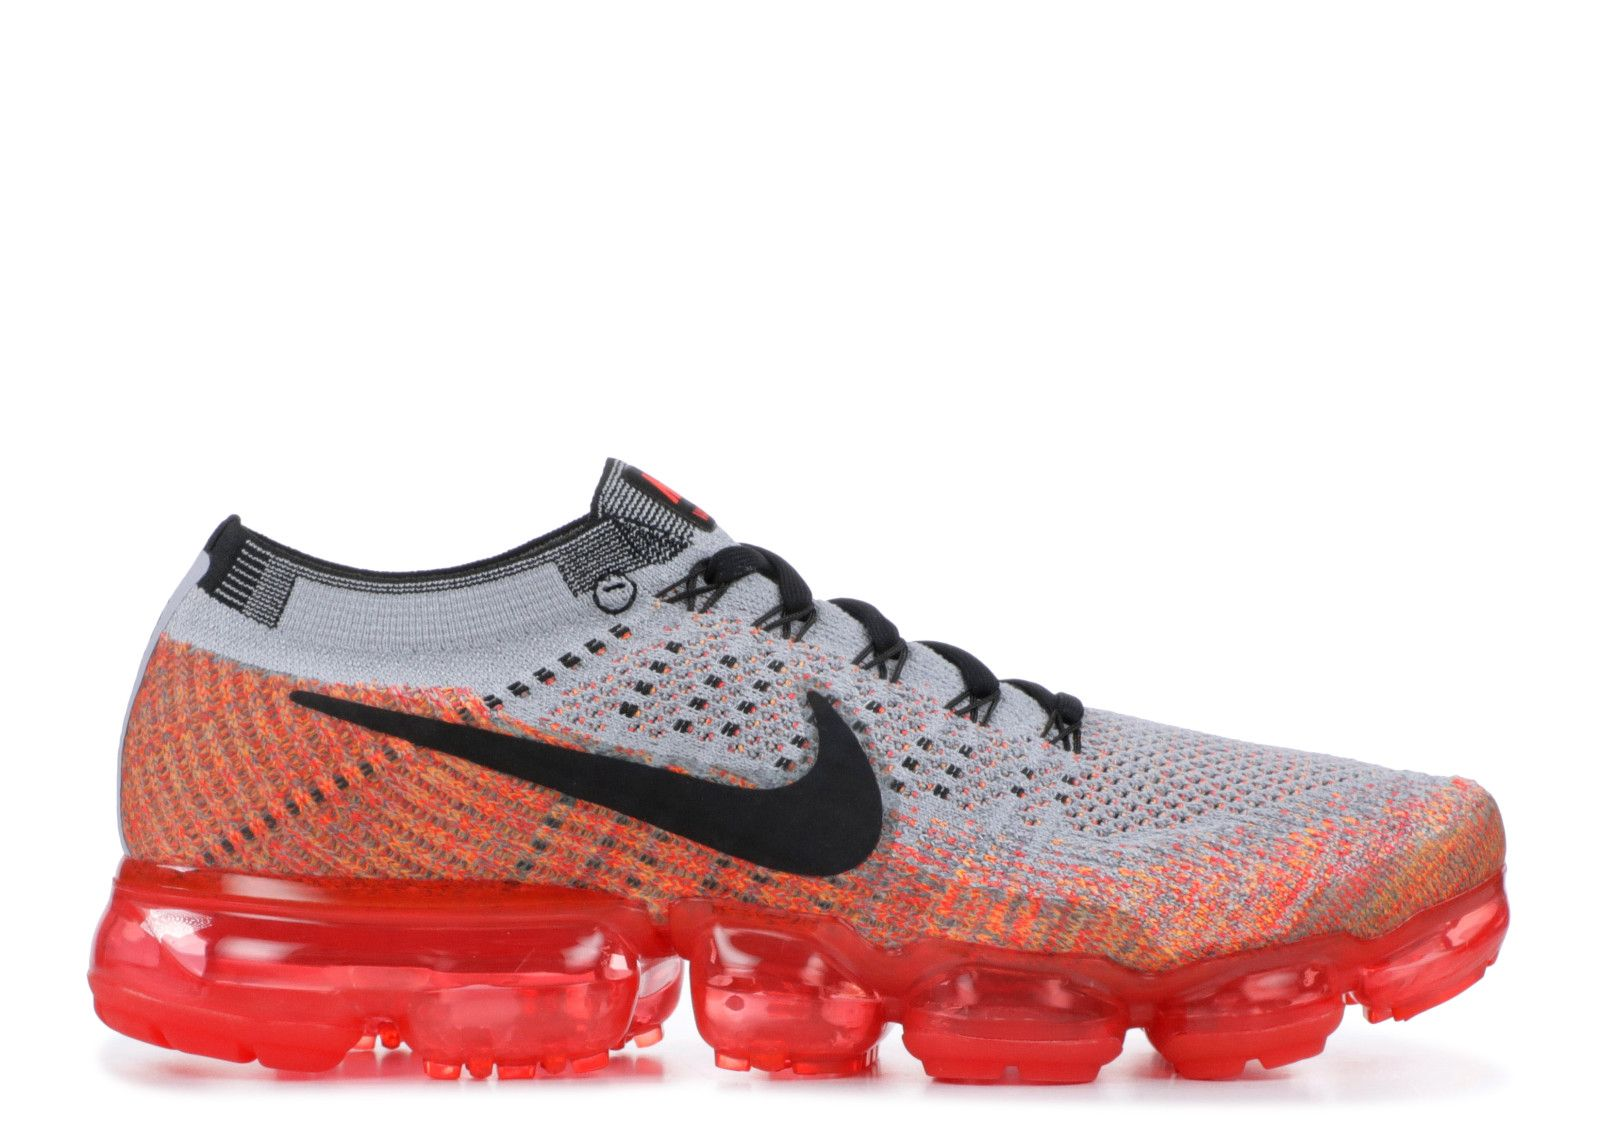 premium selection adb31 0a01d Wmns Nike Air Vapormax Flyknit